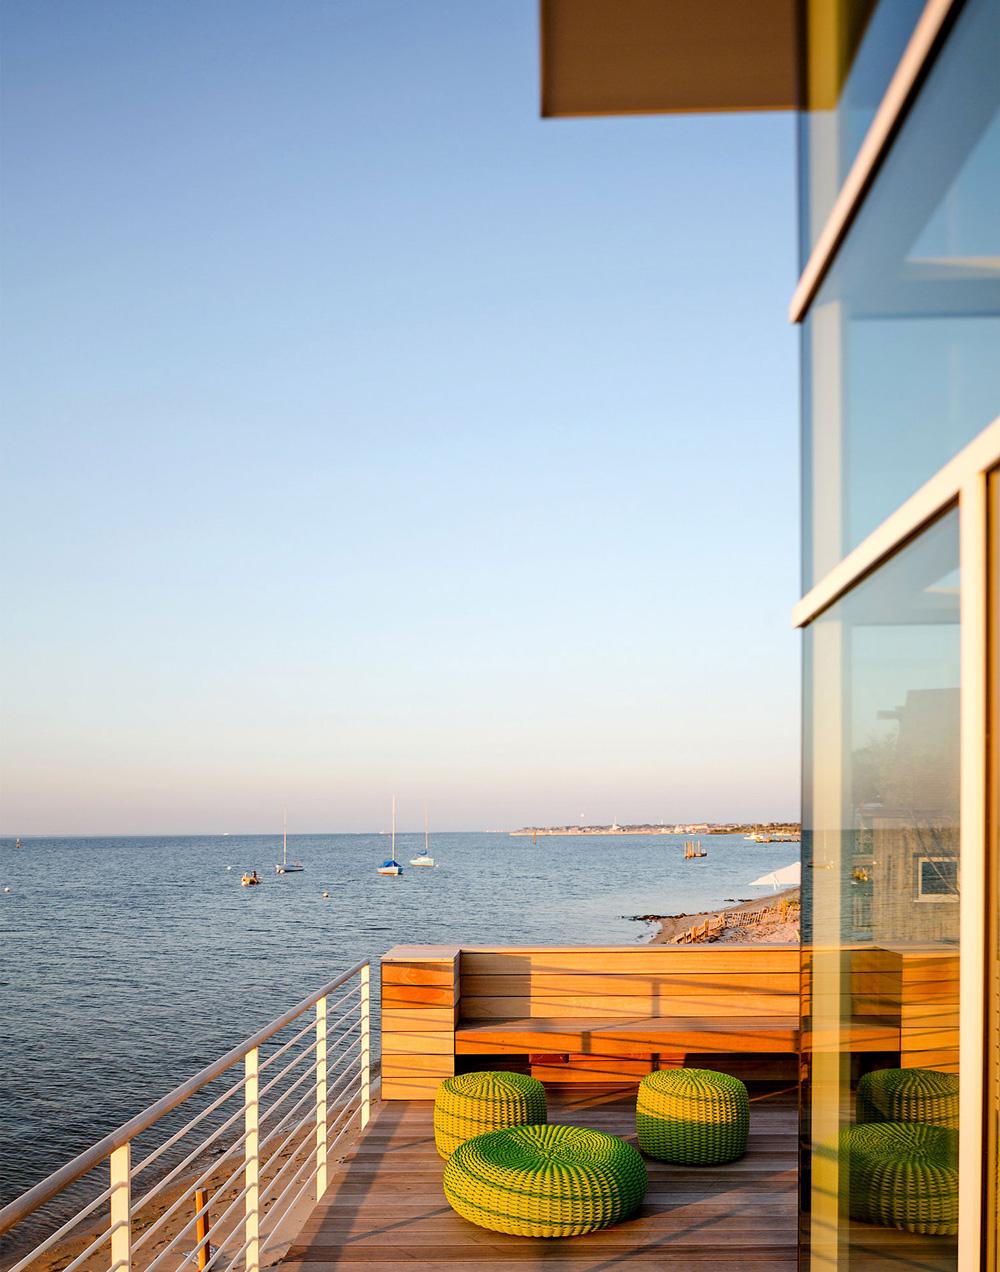 Outdoor Furniture, Balcony, Sea Views, Richard Meier's Fire Island House